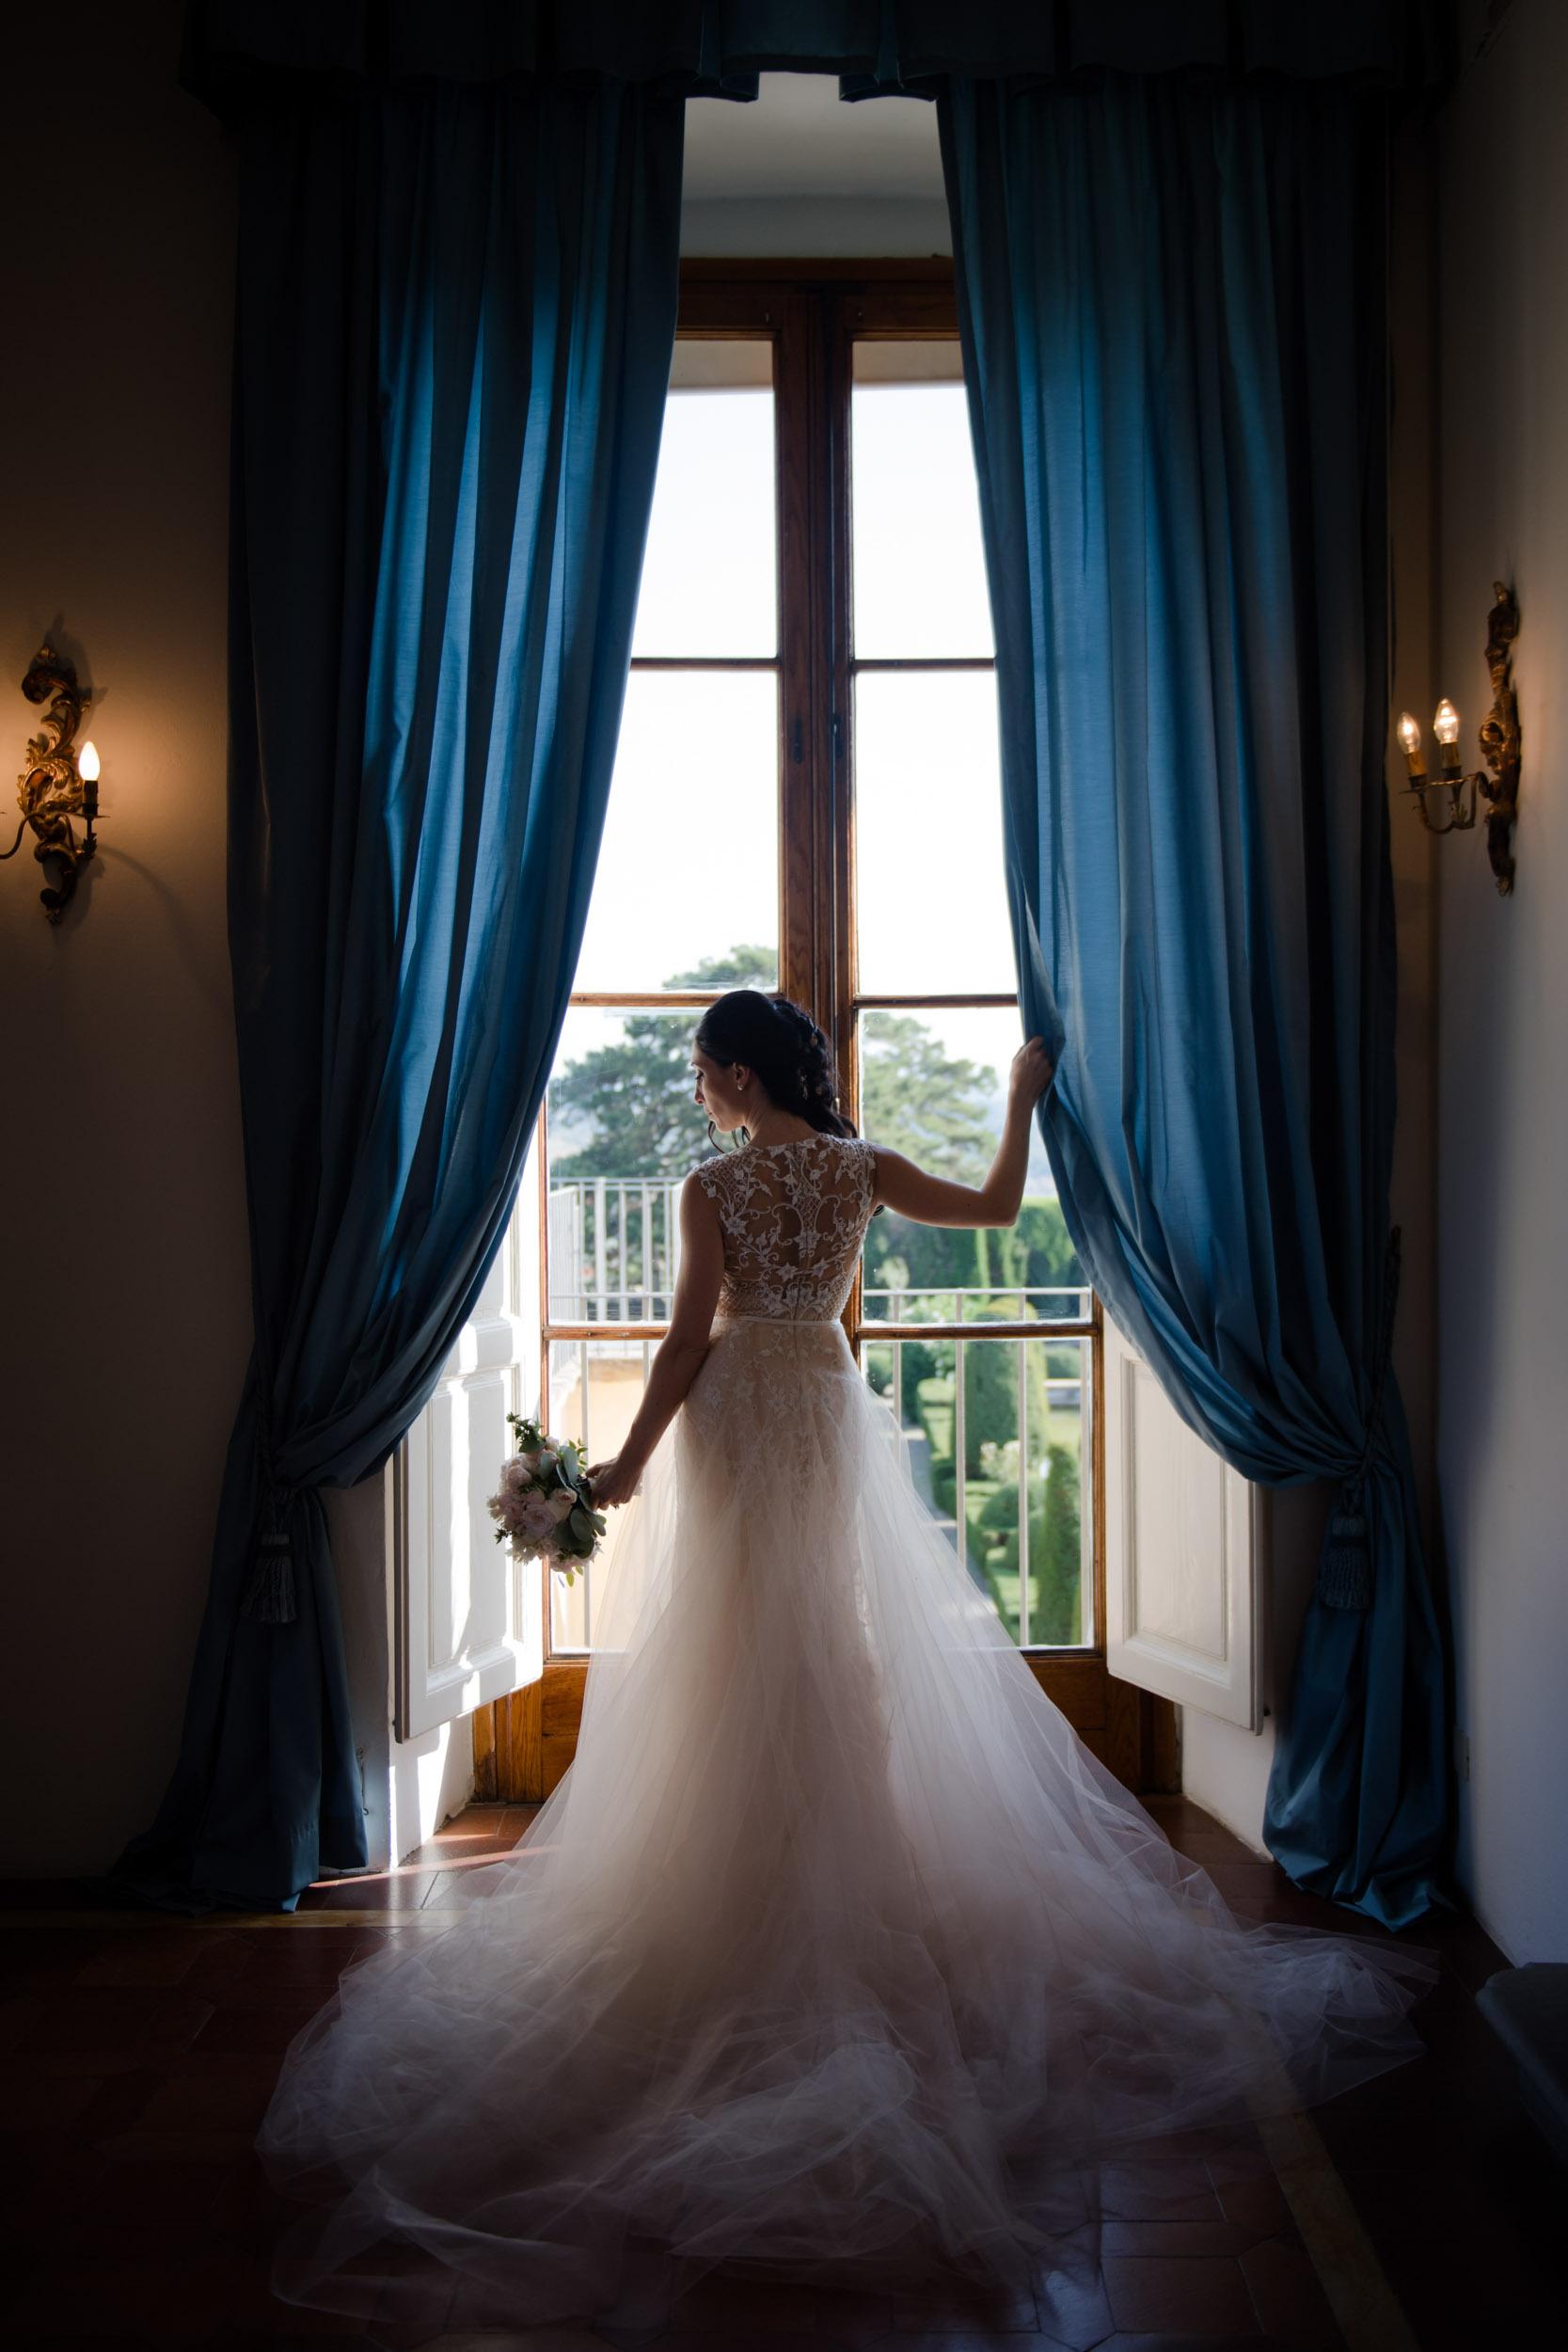 villa-gamberaia-florence-italy-destination-wedding-38.jpg